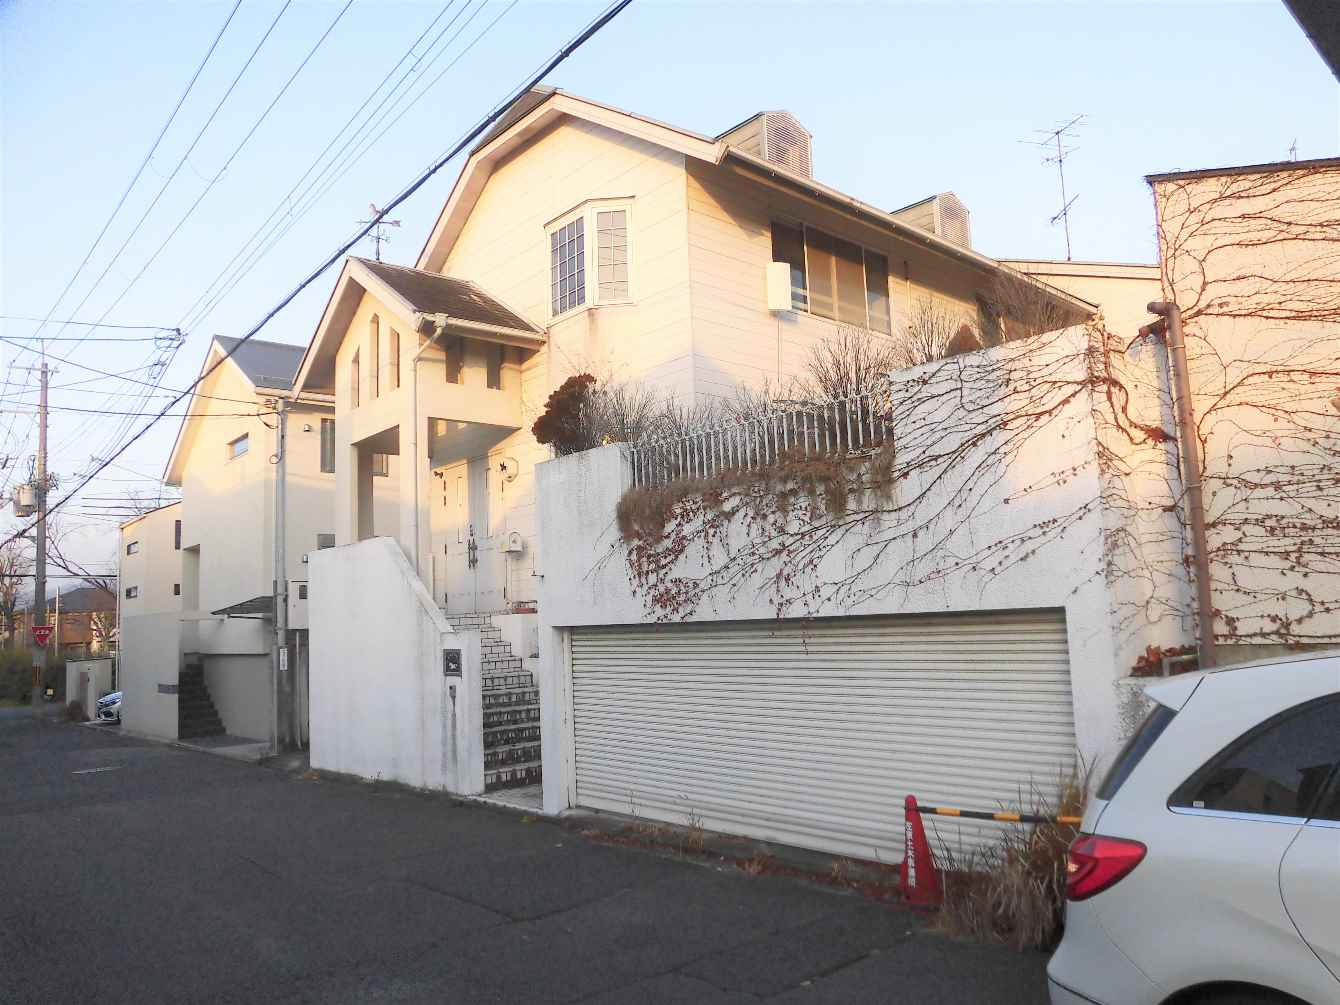 Residential House with 6 units of Apartment, for Sale in Kitashirakawa Higashisenouchi-cho, Sakyo Ward